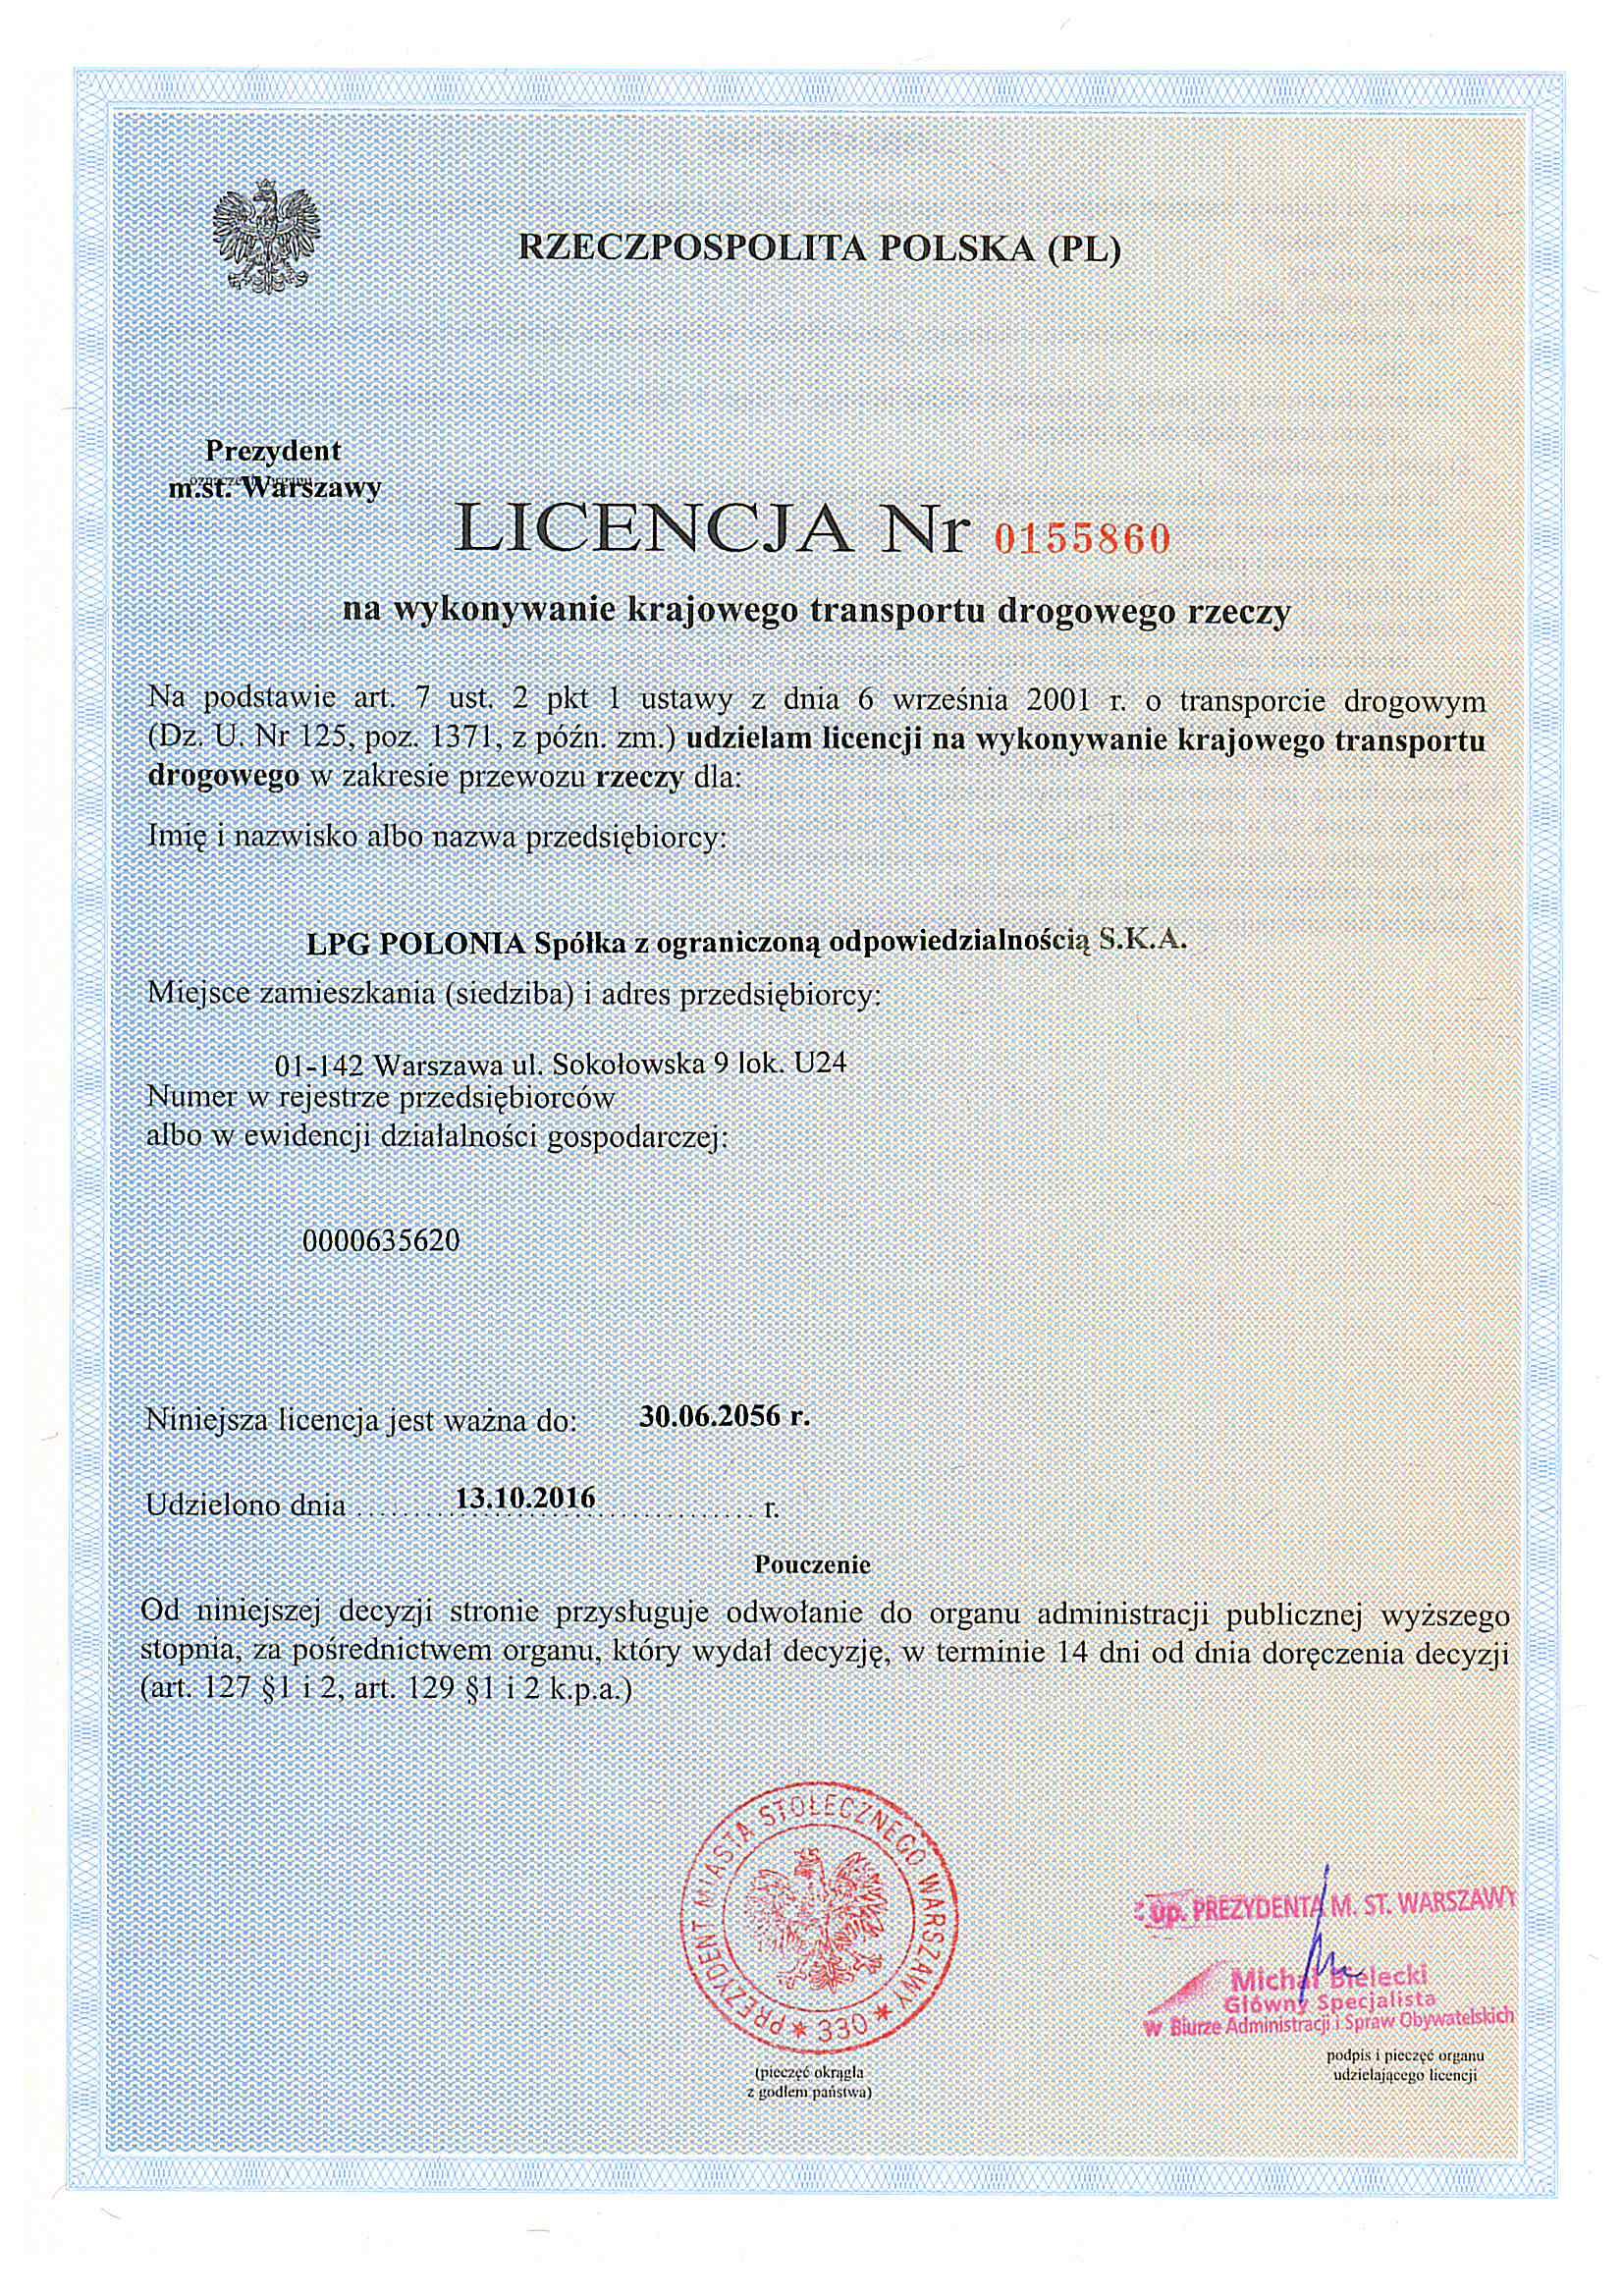 Licencja polska